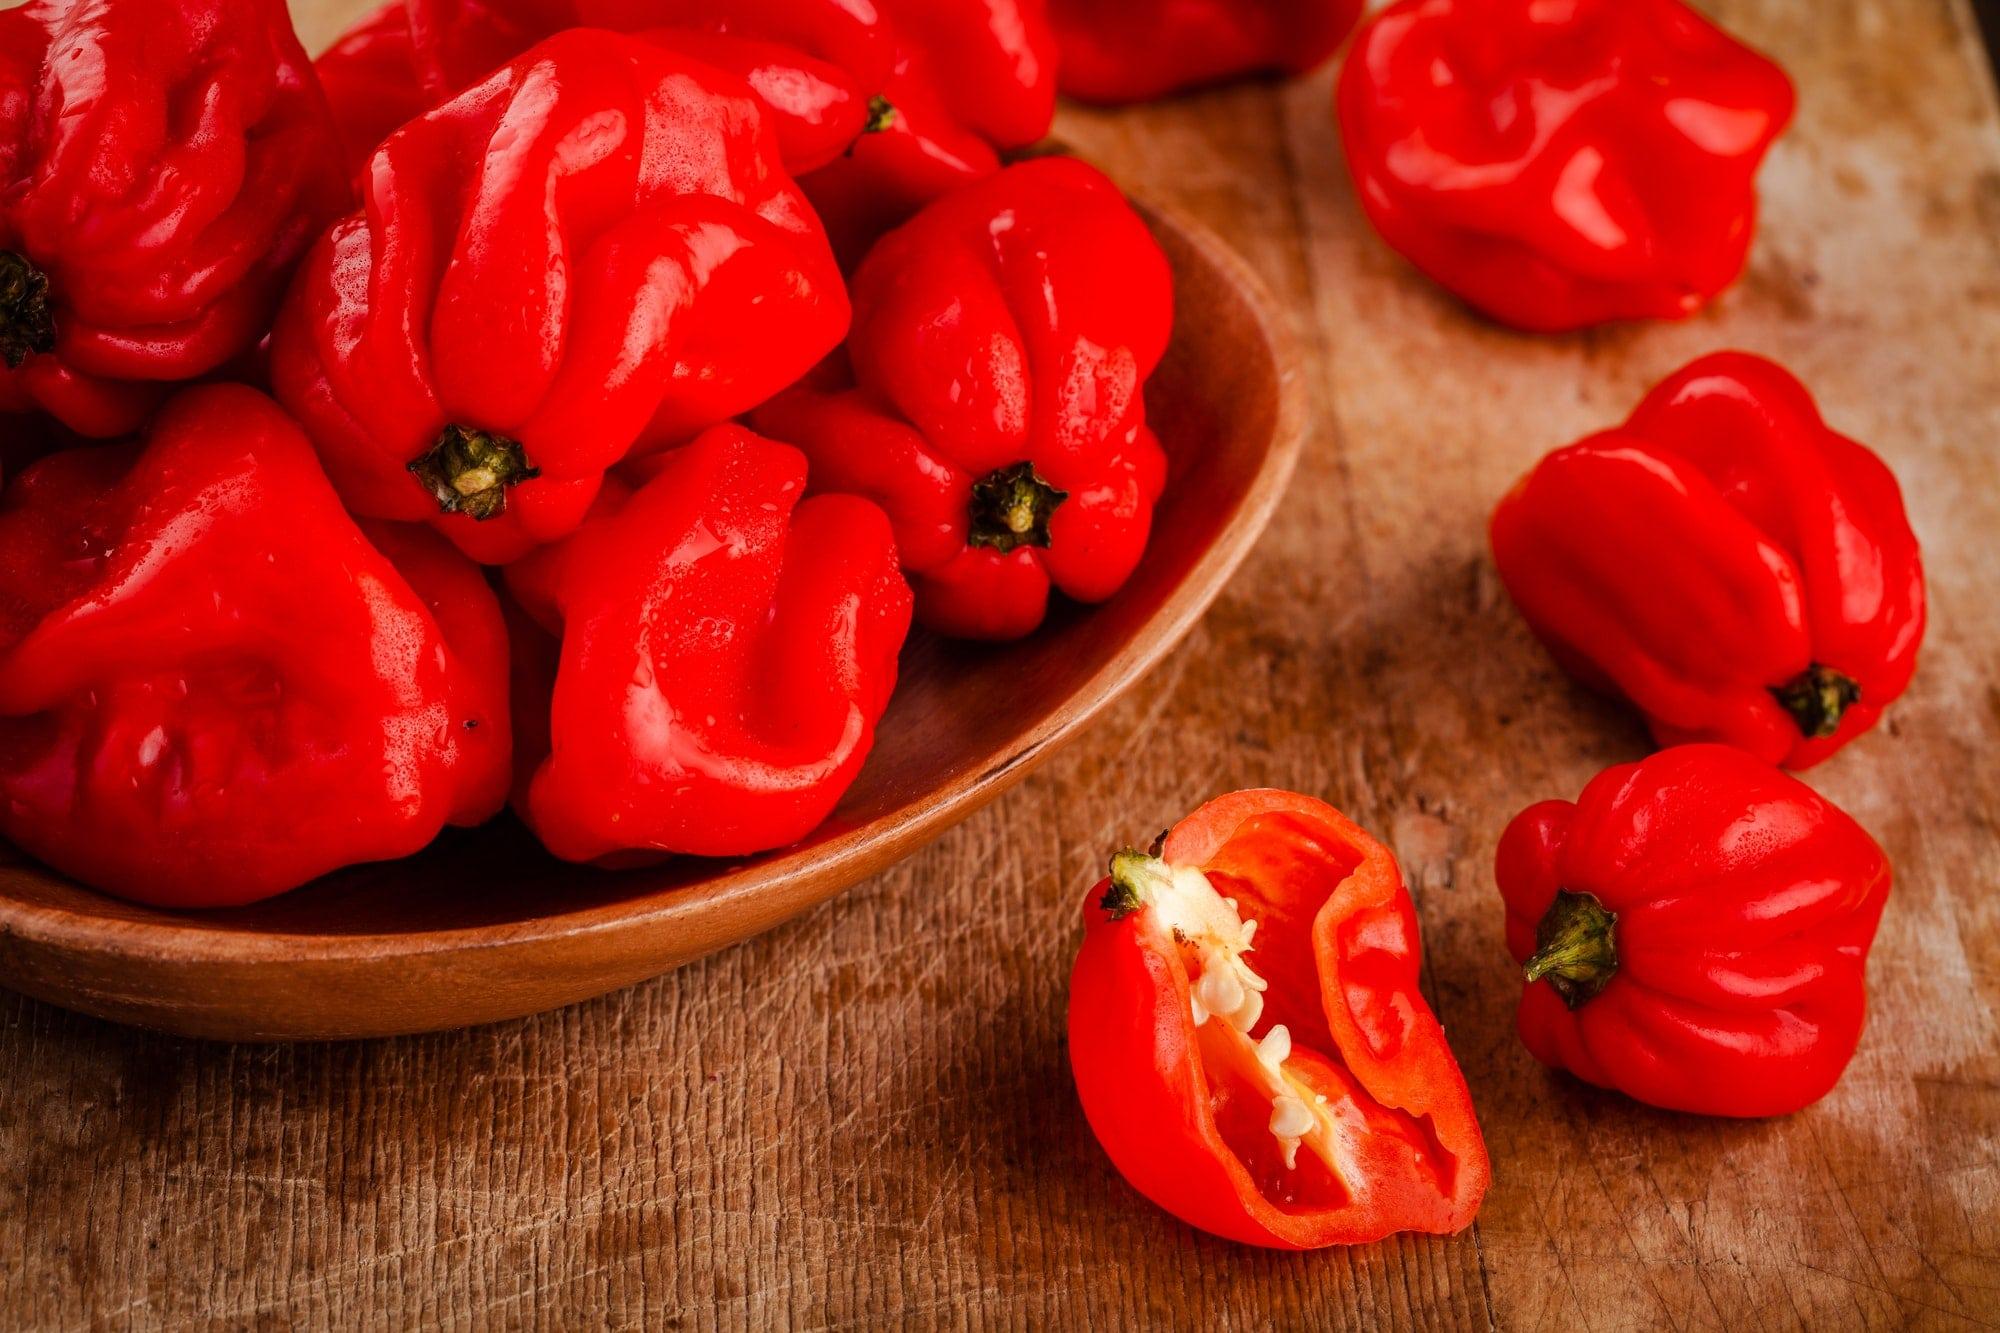 fresh red hot habanero chili peppers